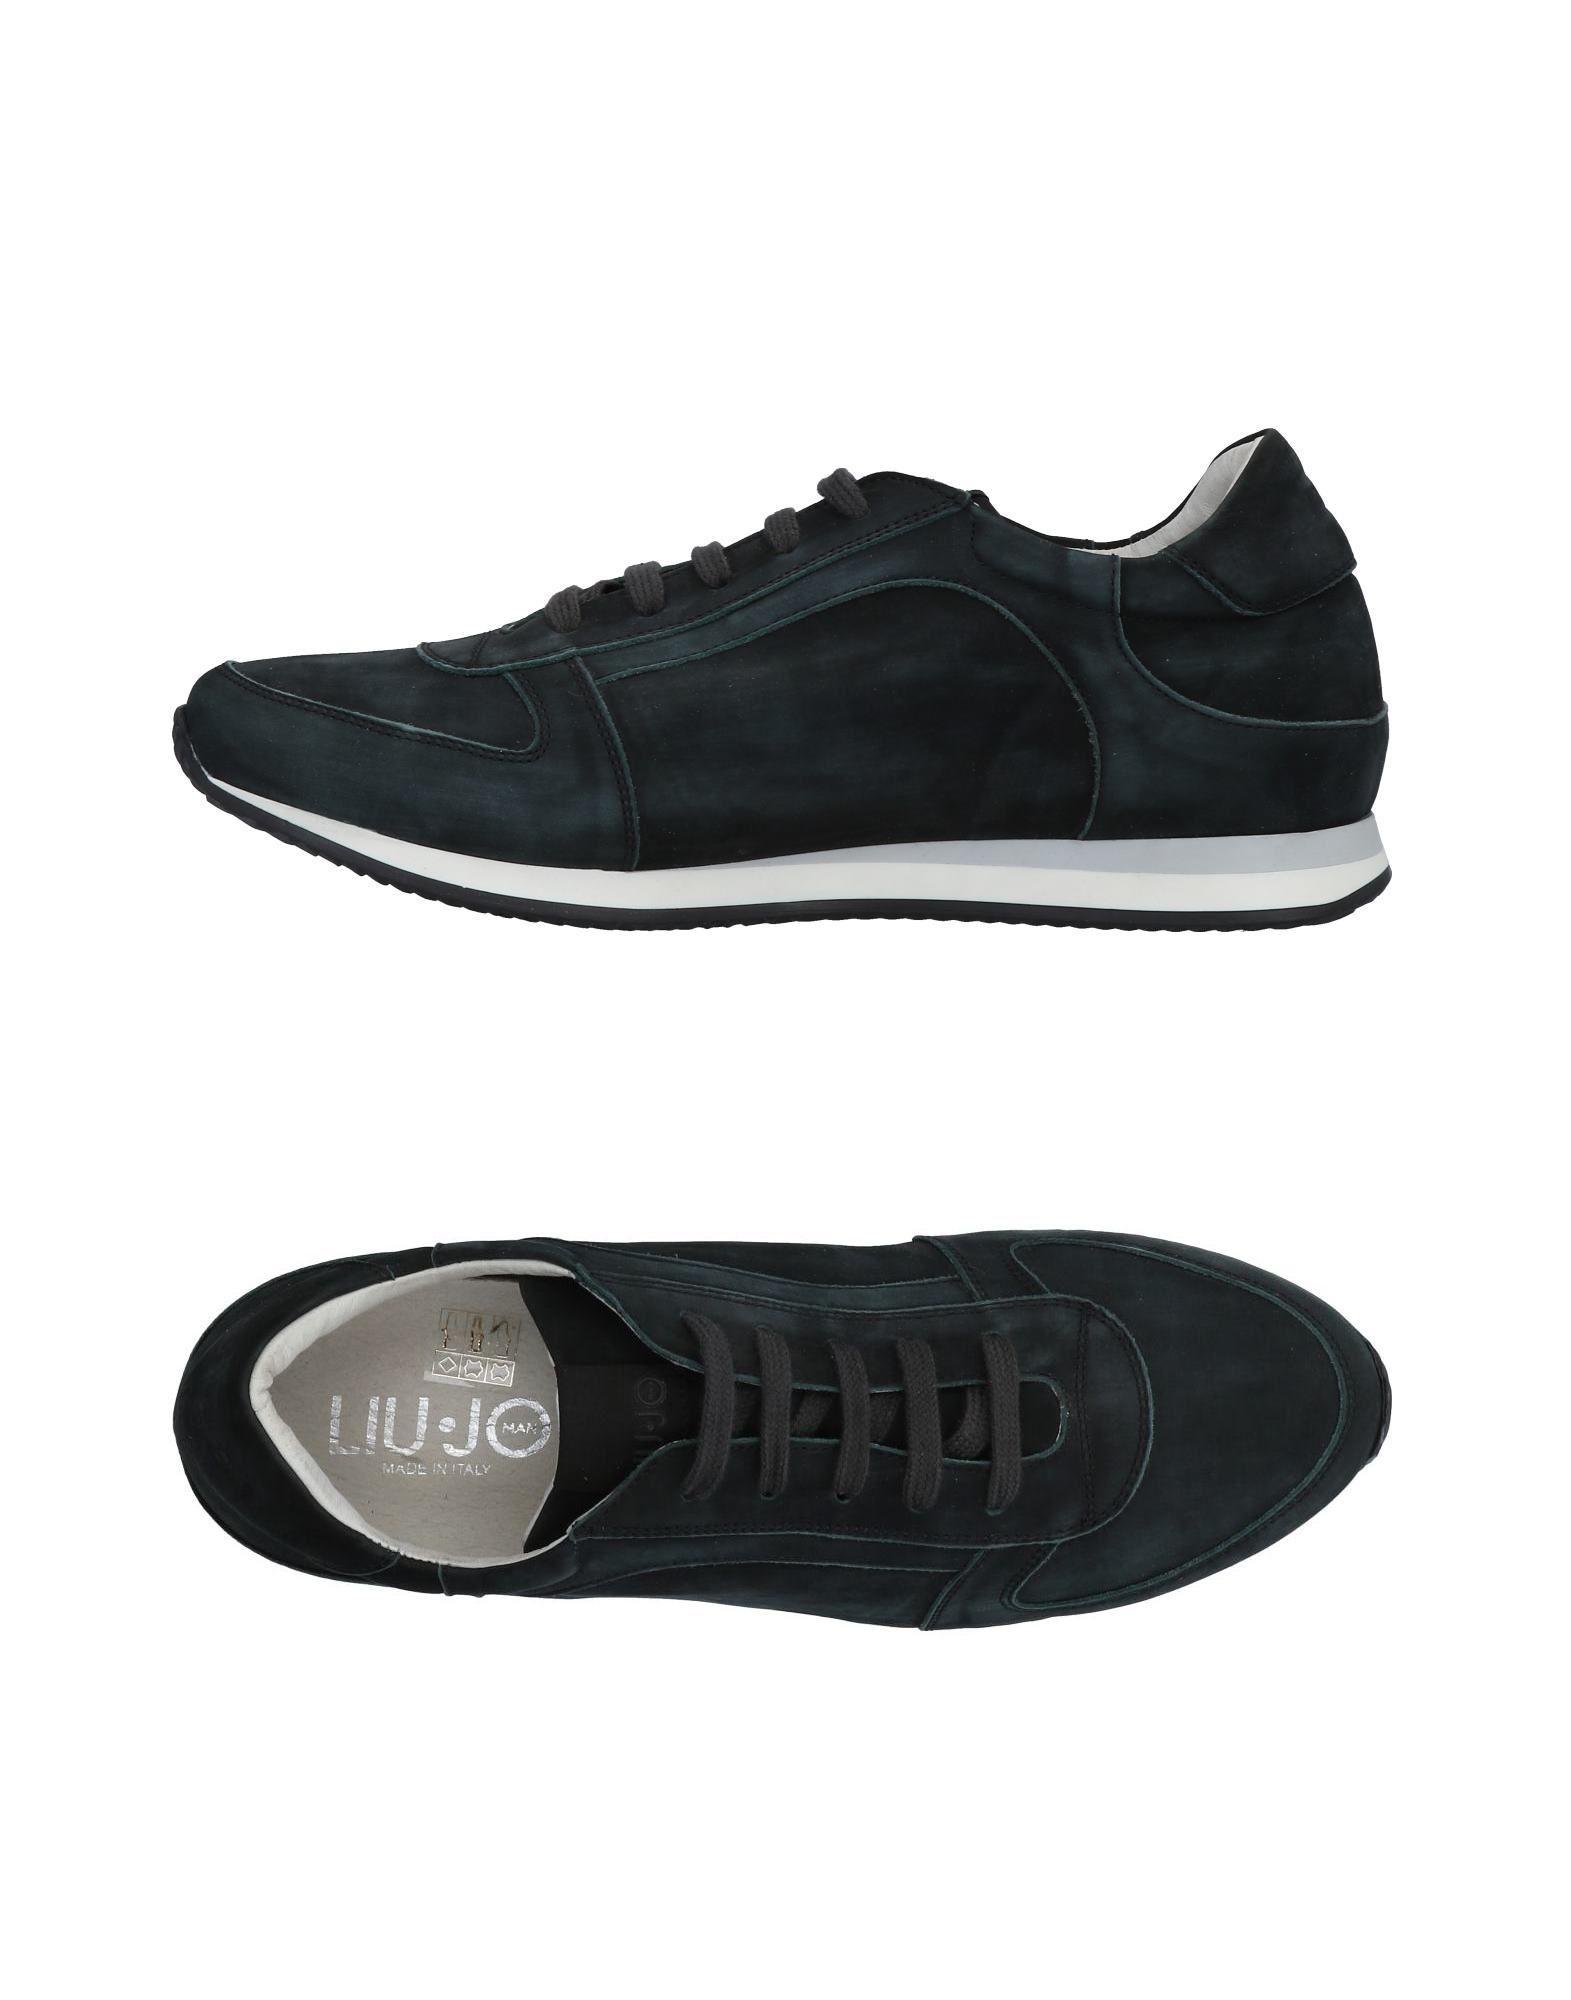 Liu •Jo Man Sneakers Herren  11485365AV Neue Schuhe